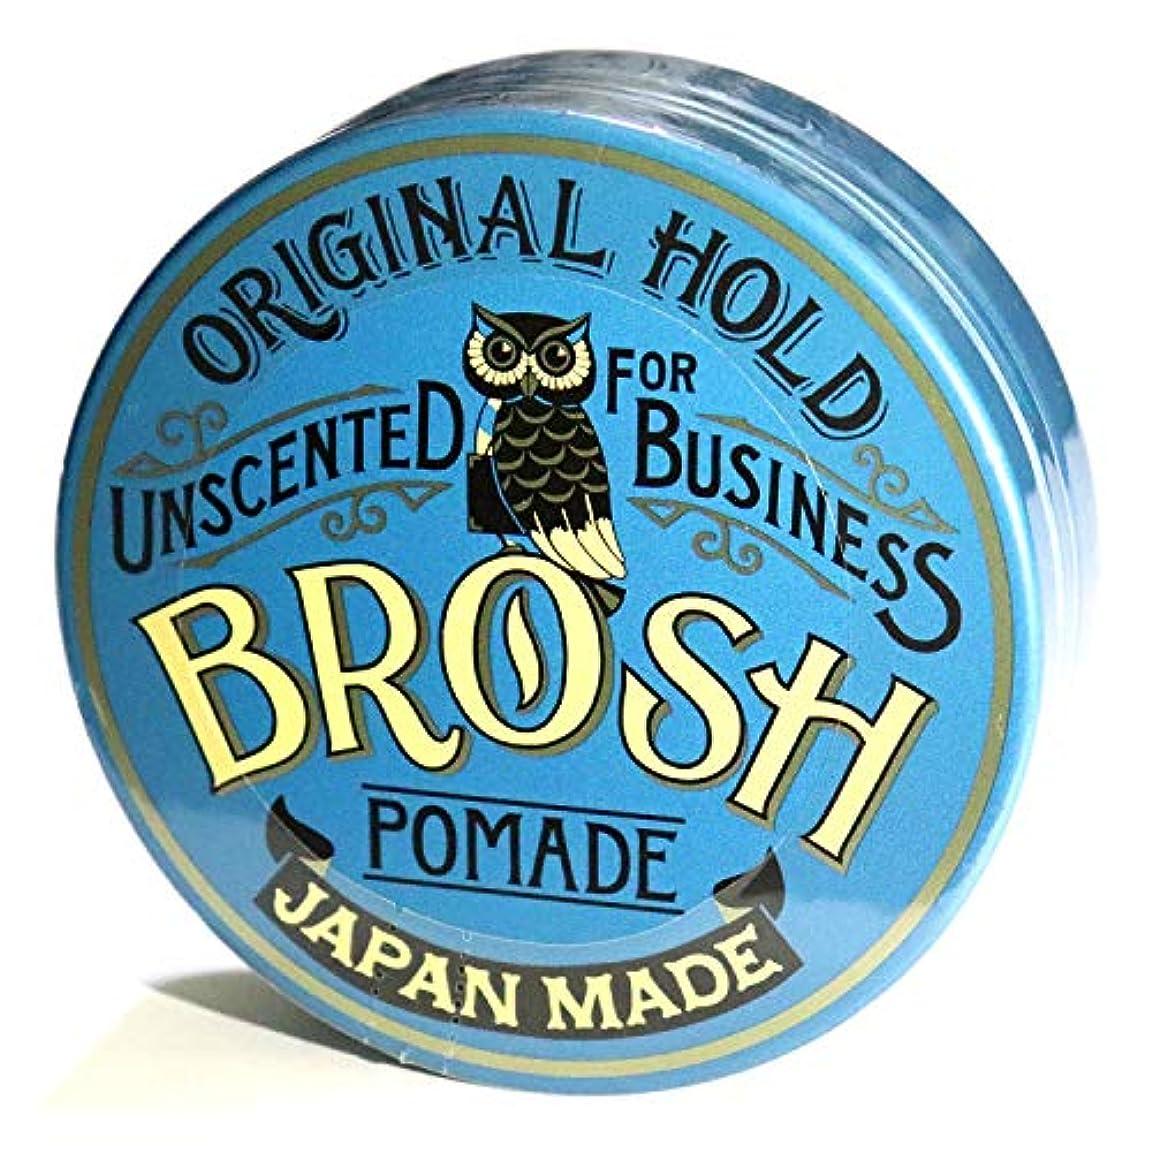 BROSH (ブロッシュ) BROSH POMADE UNSCENTED/BIZ 115g 水性ポマード 整髪料 無香料